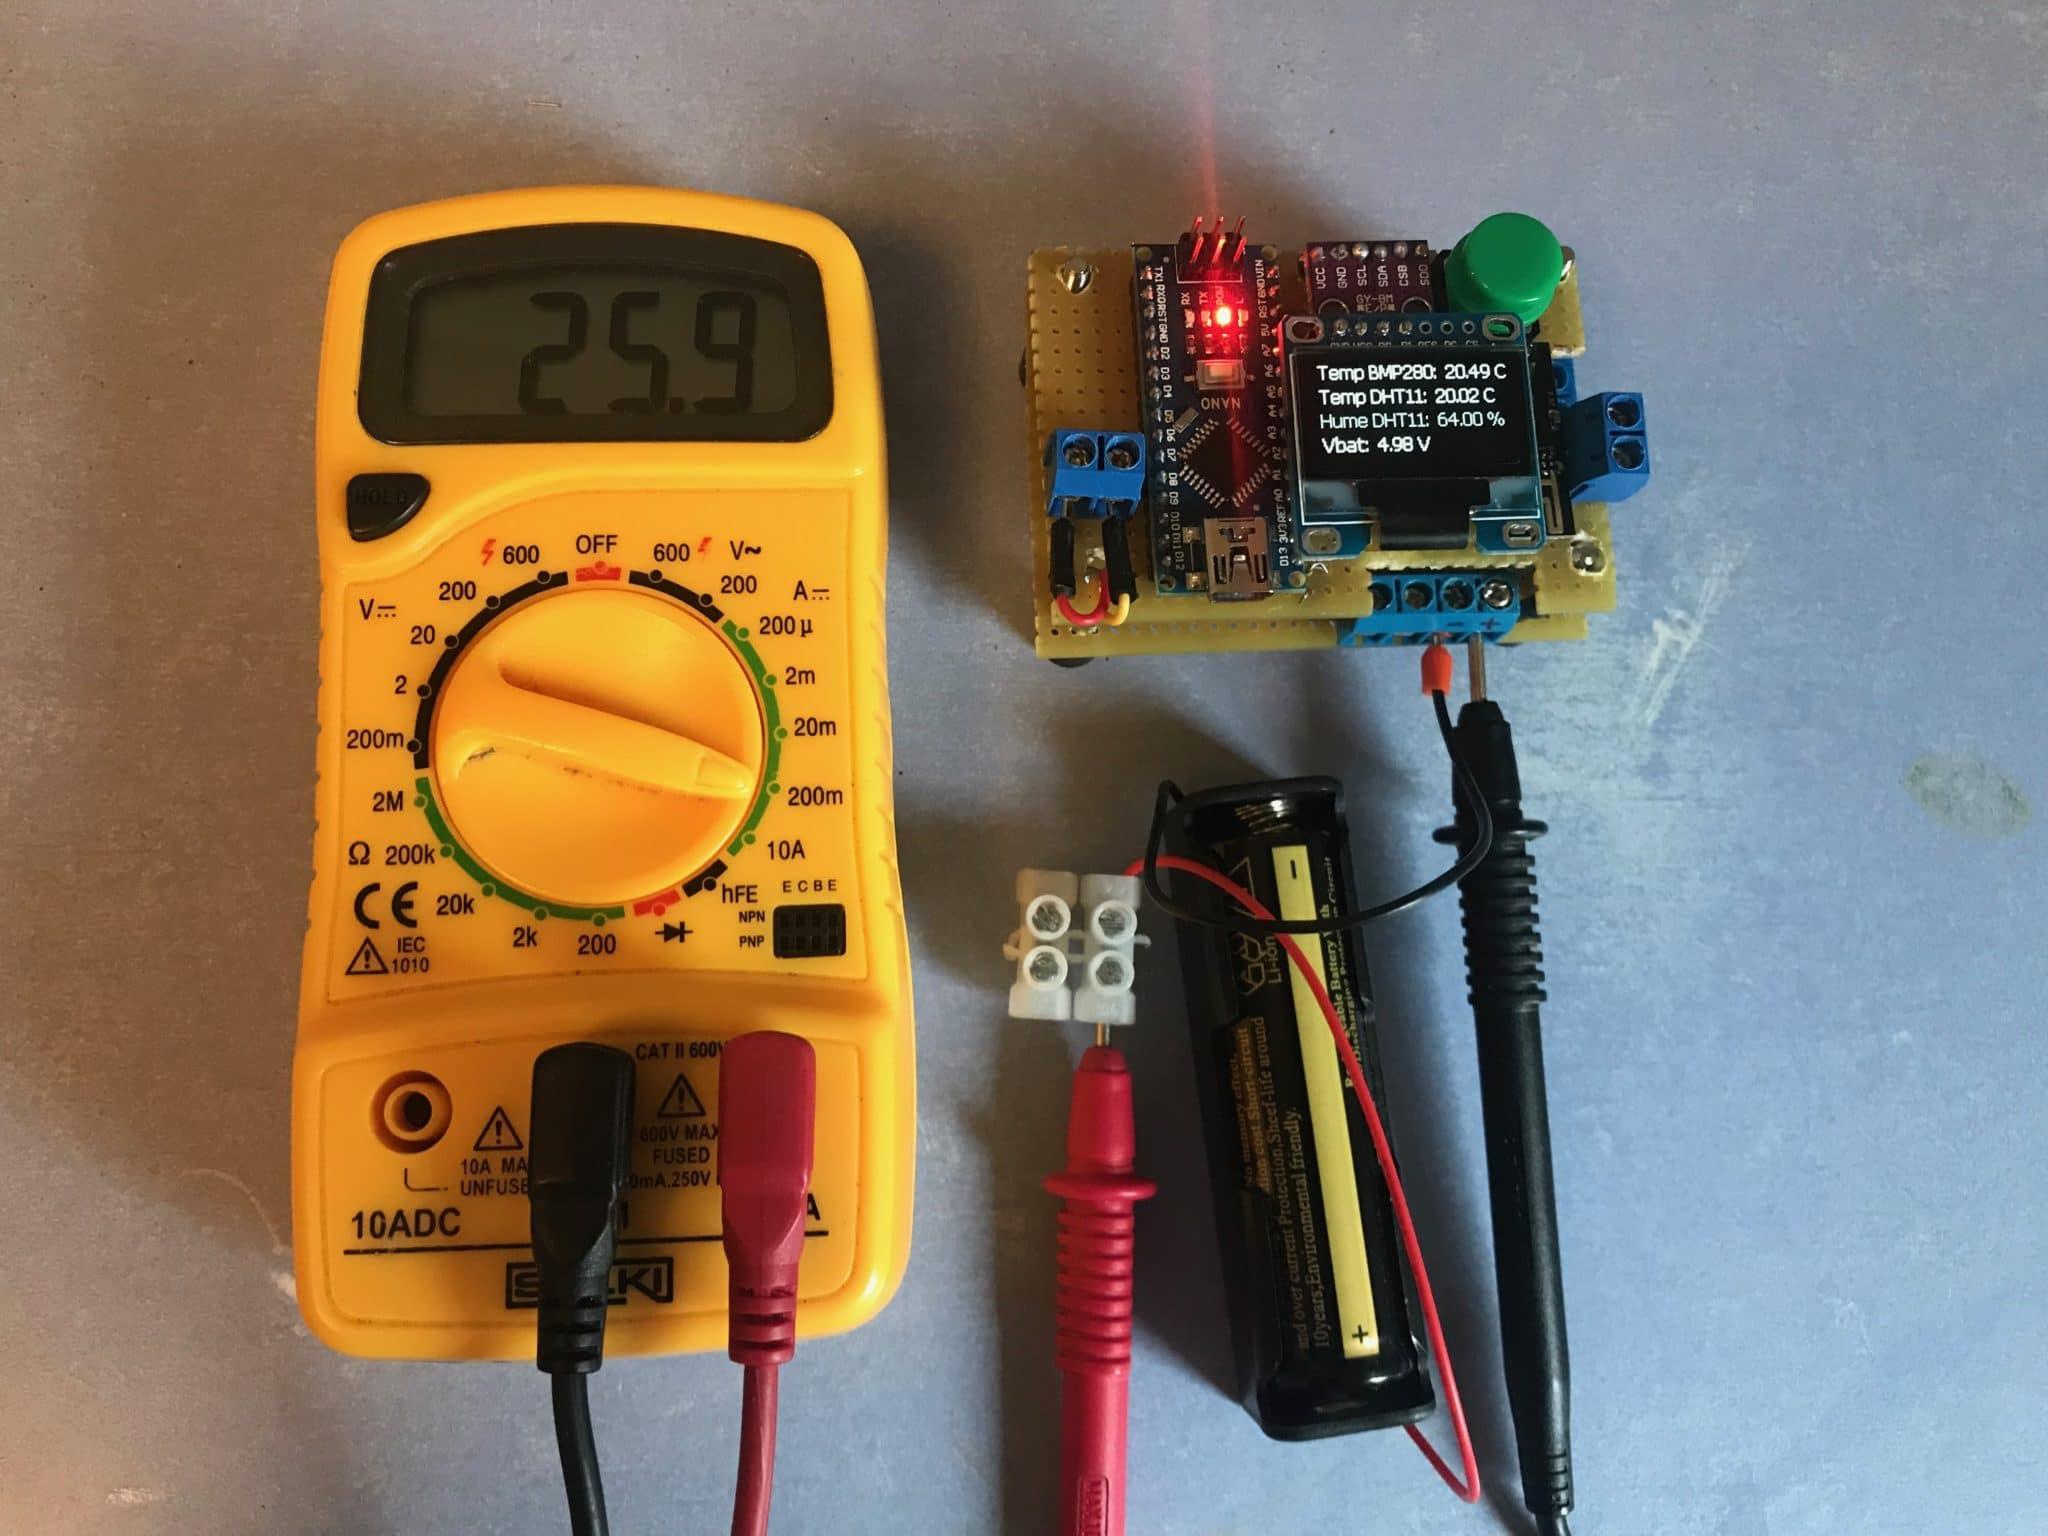 Estación meteorológica WIFI. Arduino + ESP8266-01 + ThingsPeak.com